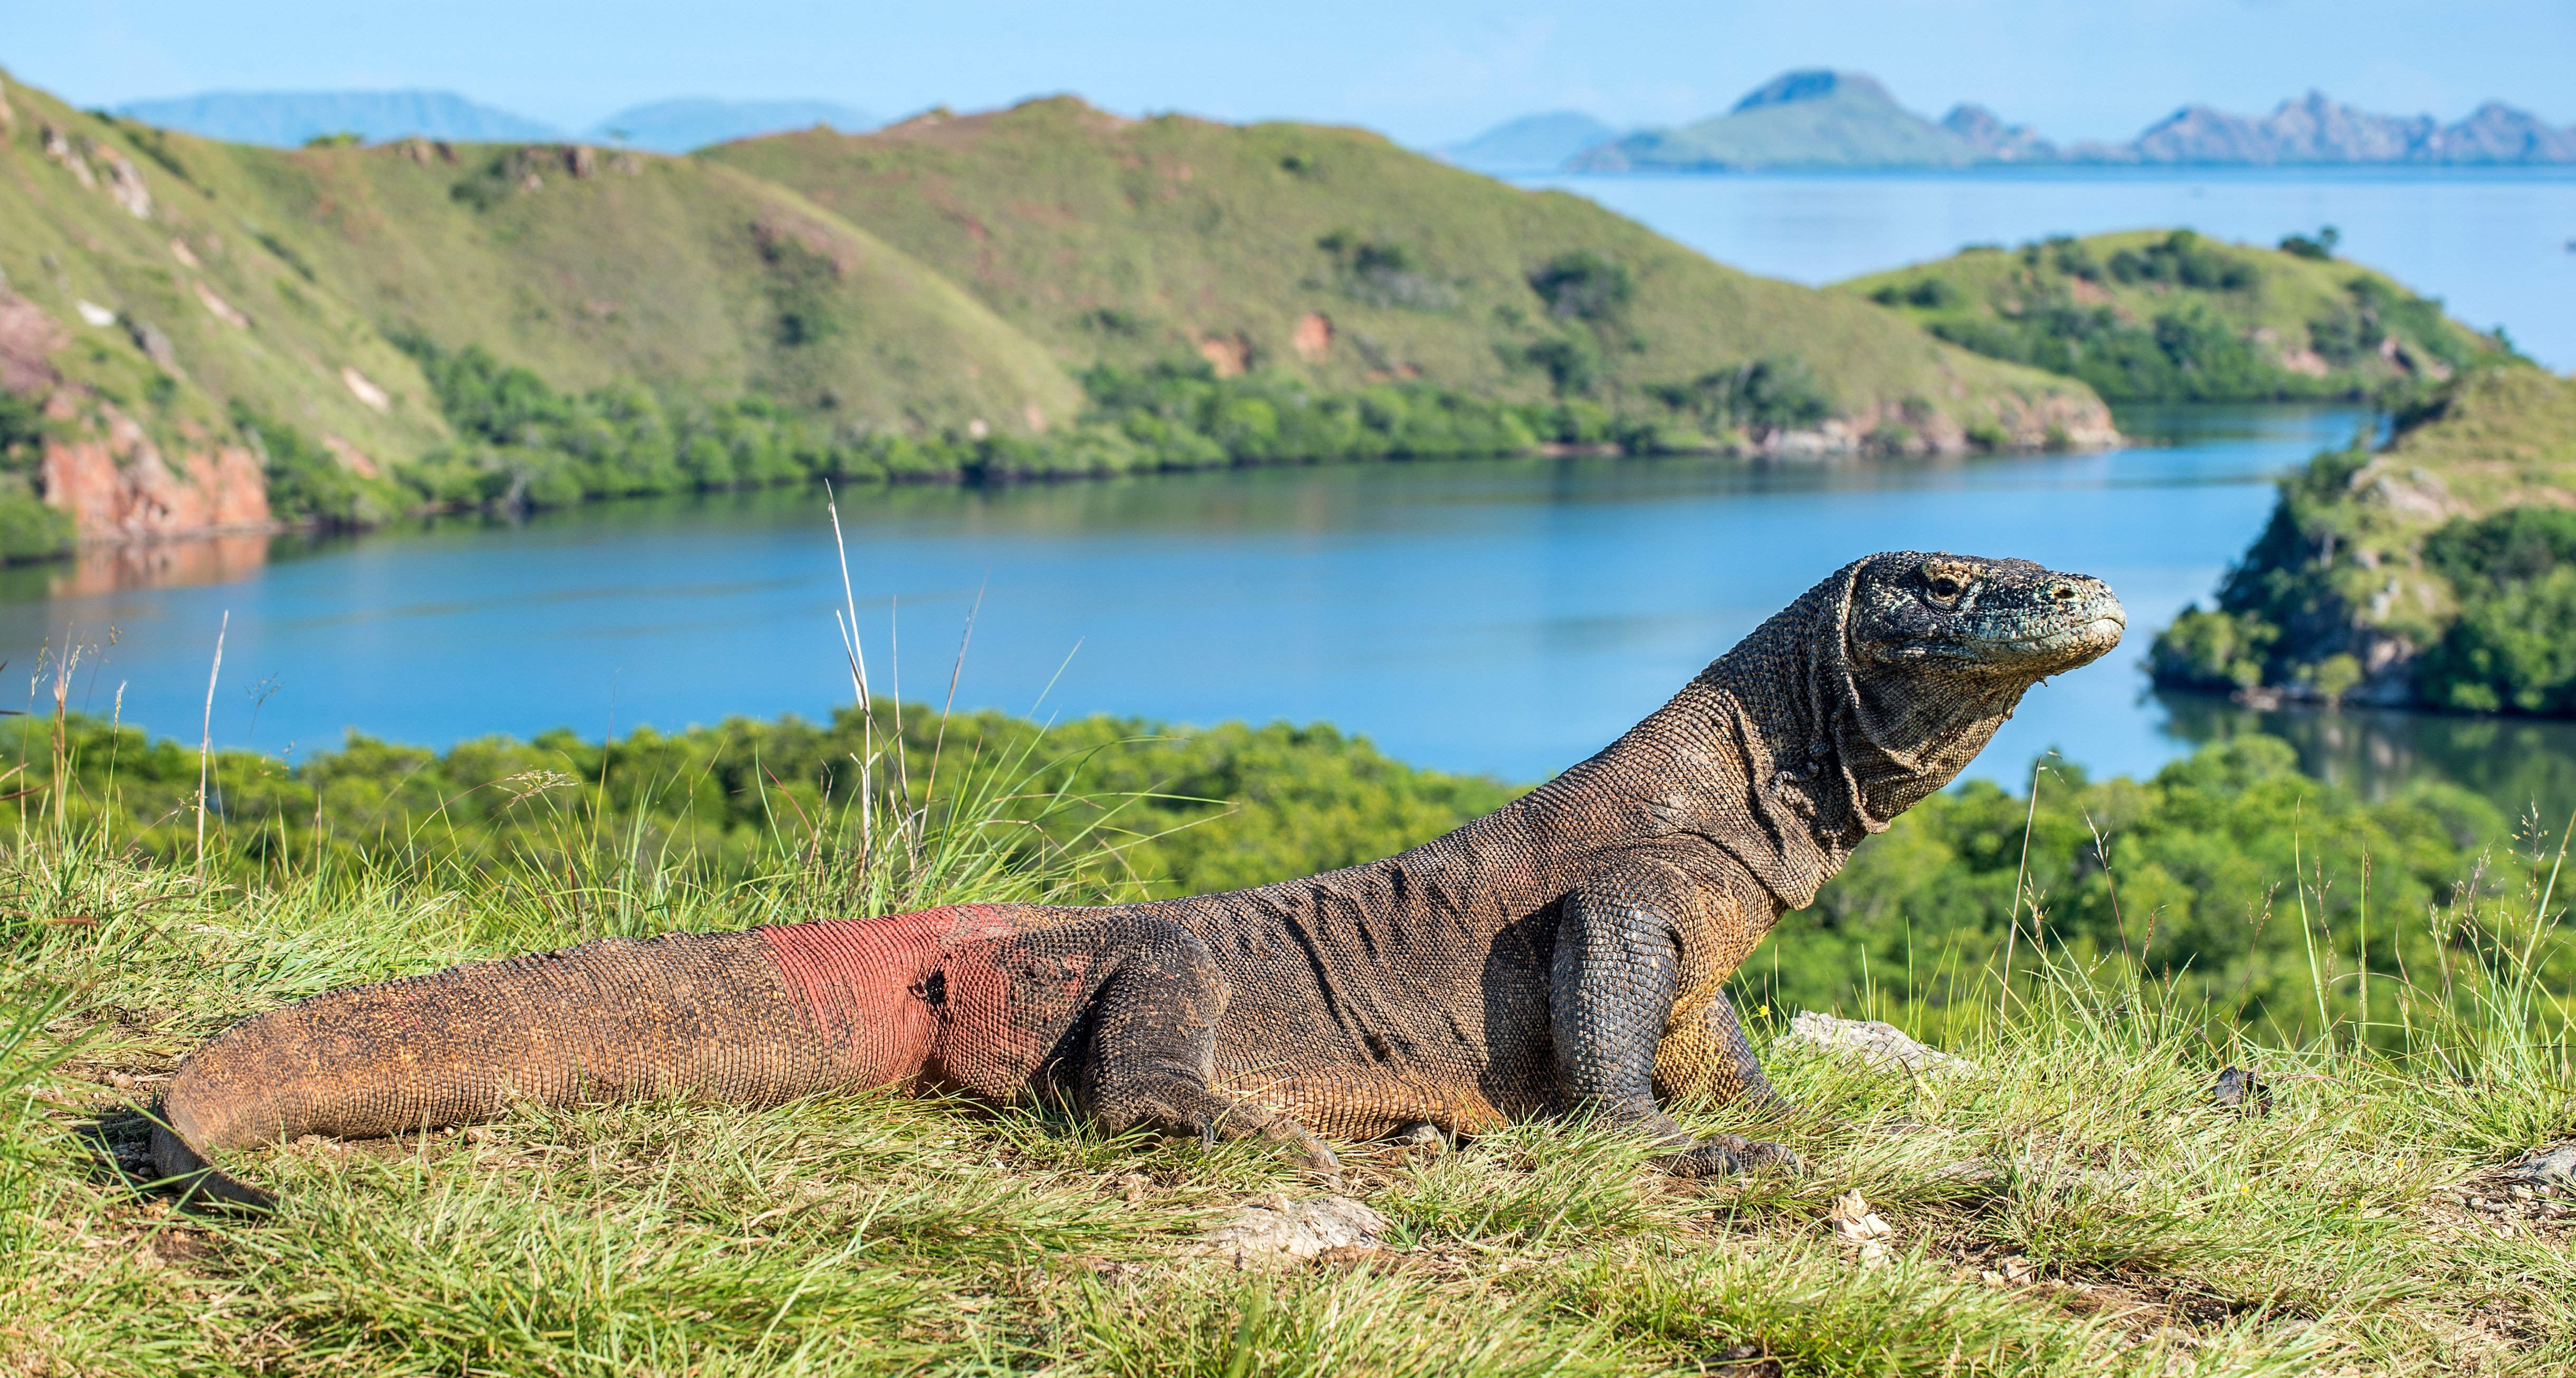 bali island, komodo island, komodo dragon, Bali adventure